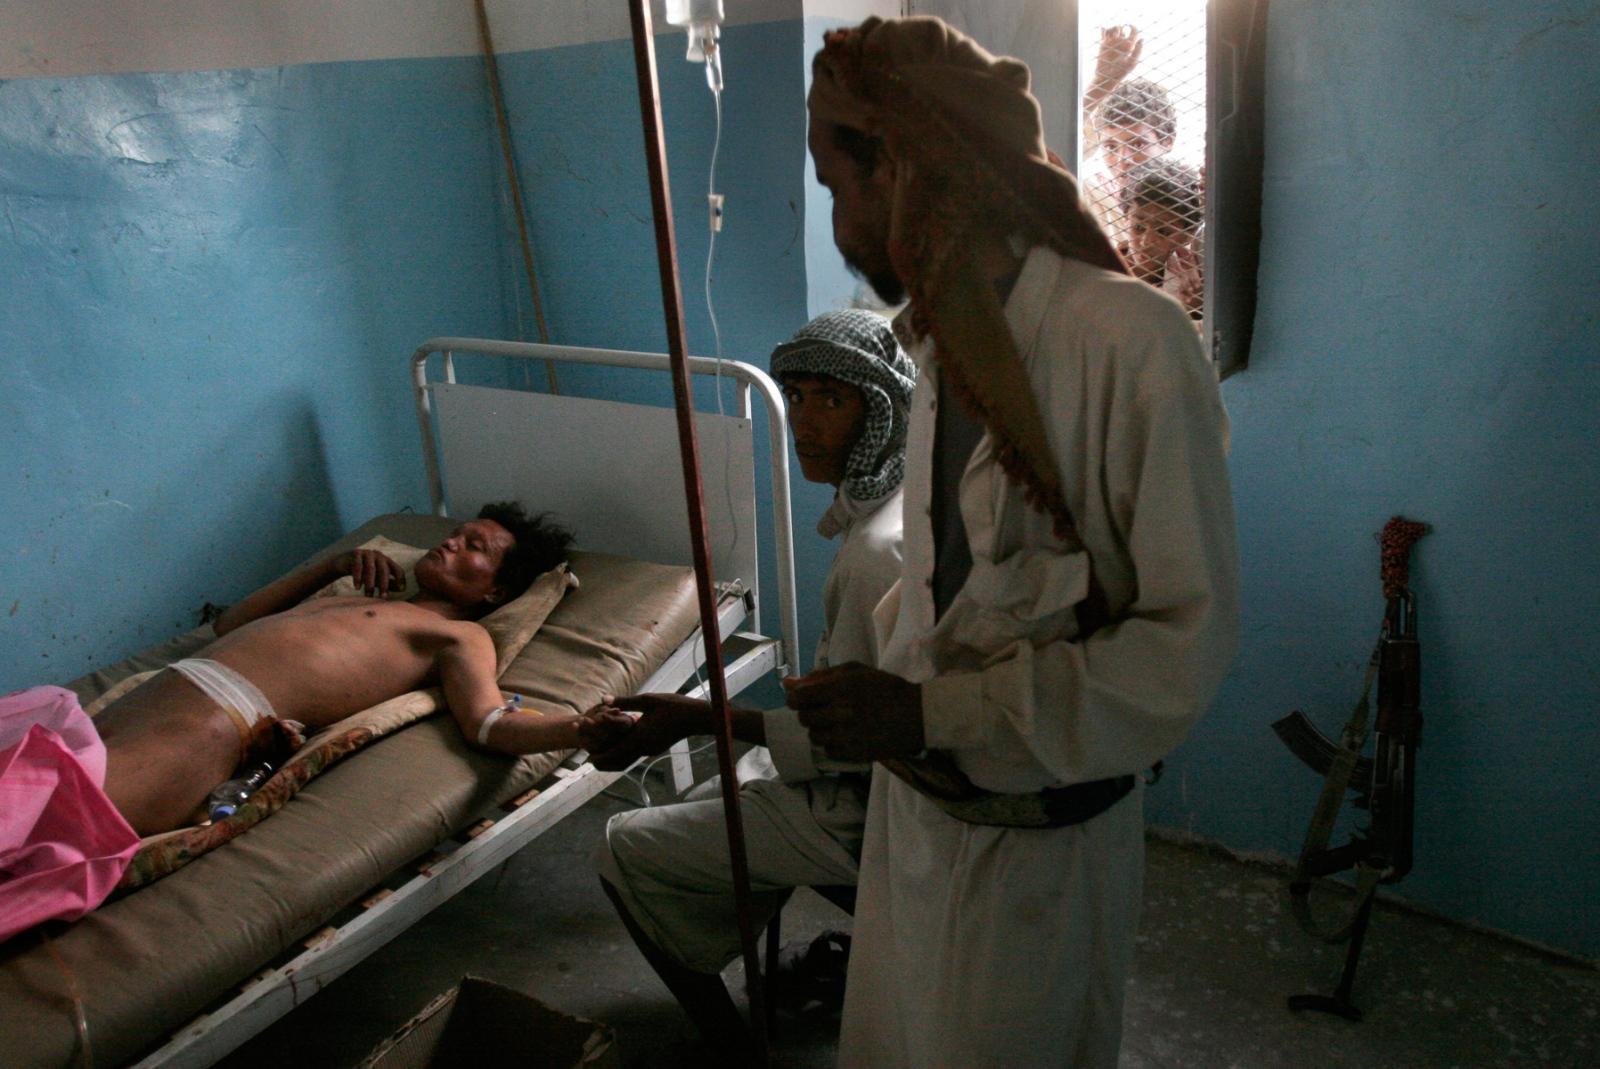 Family members watch over Sirhan bin Jaji Araban at a medical clinic in Mymerra. He was shot in a dispute that prompted by Sheik Rabea al-Okaimi's mediation efforts.